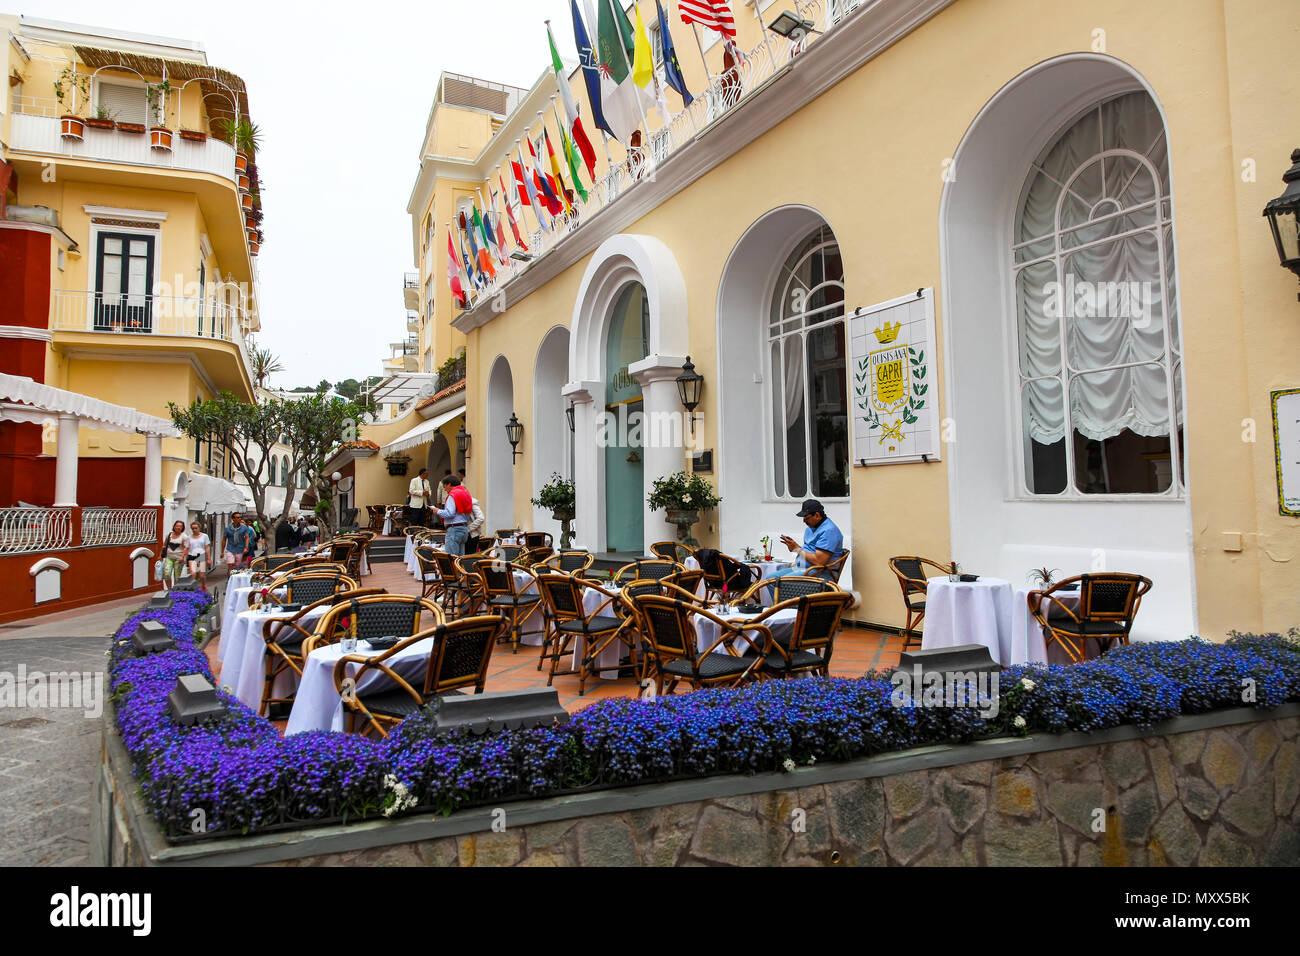 Grand Hotel Quisisana on Via Camerelle on the island of Capri, Italy - Stock Image